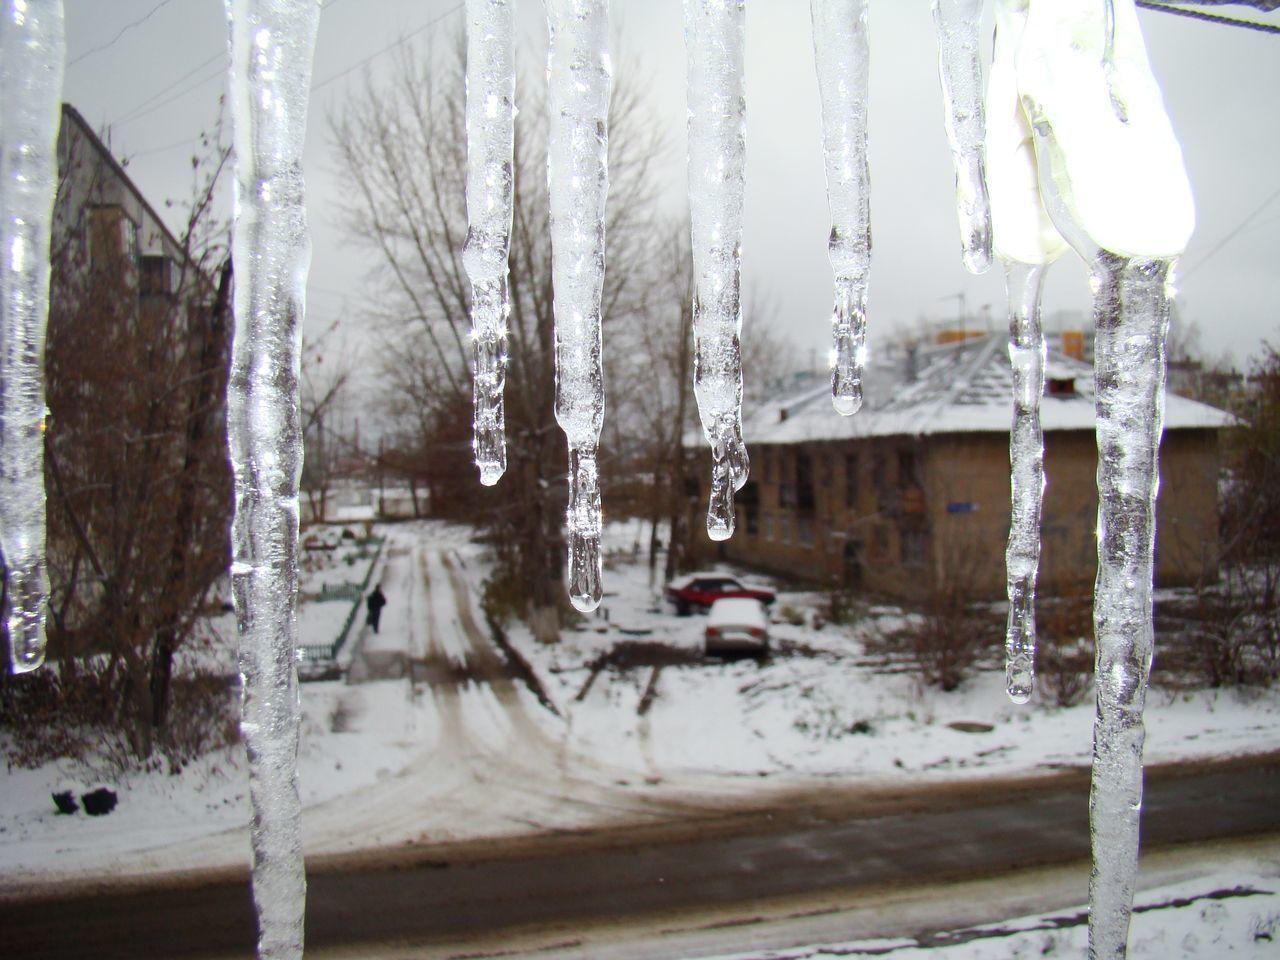 Ранняя весна сосульки макро Ice RussiaLoveWorld My First Eyem Photo весна